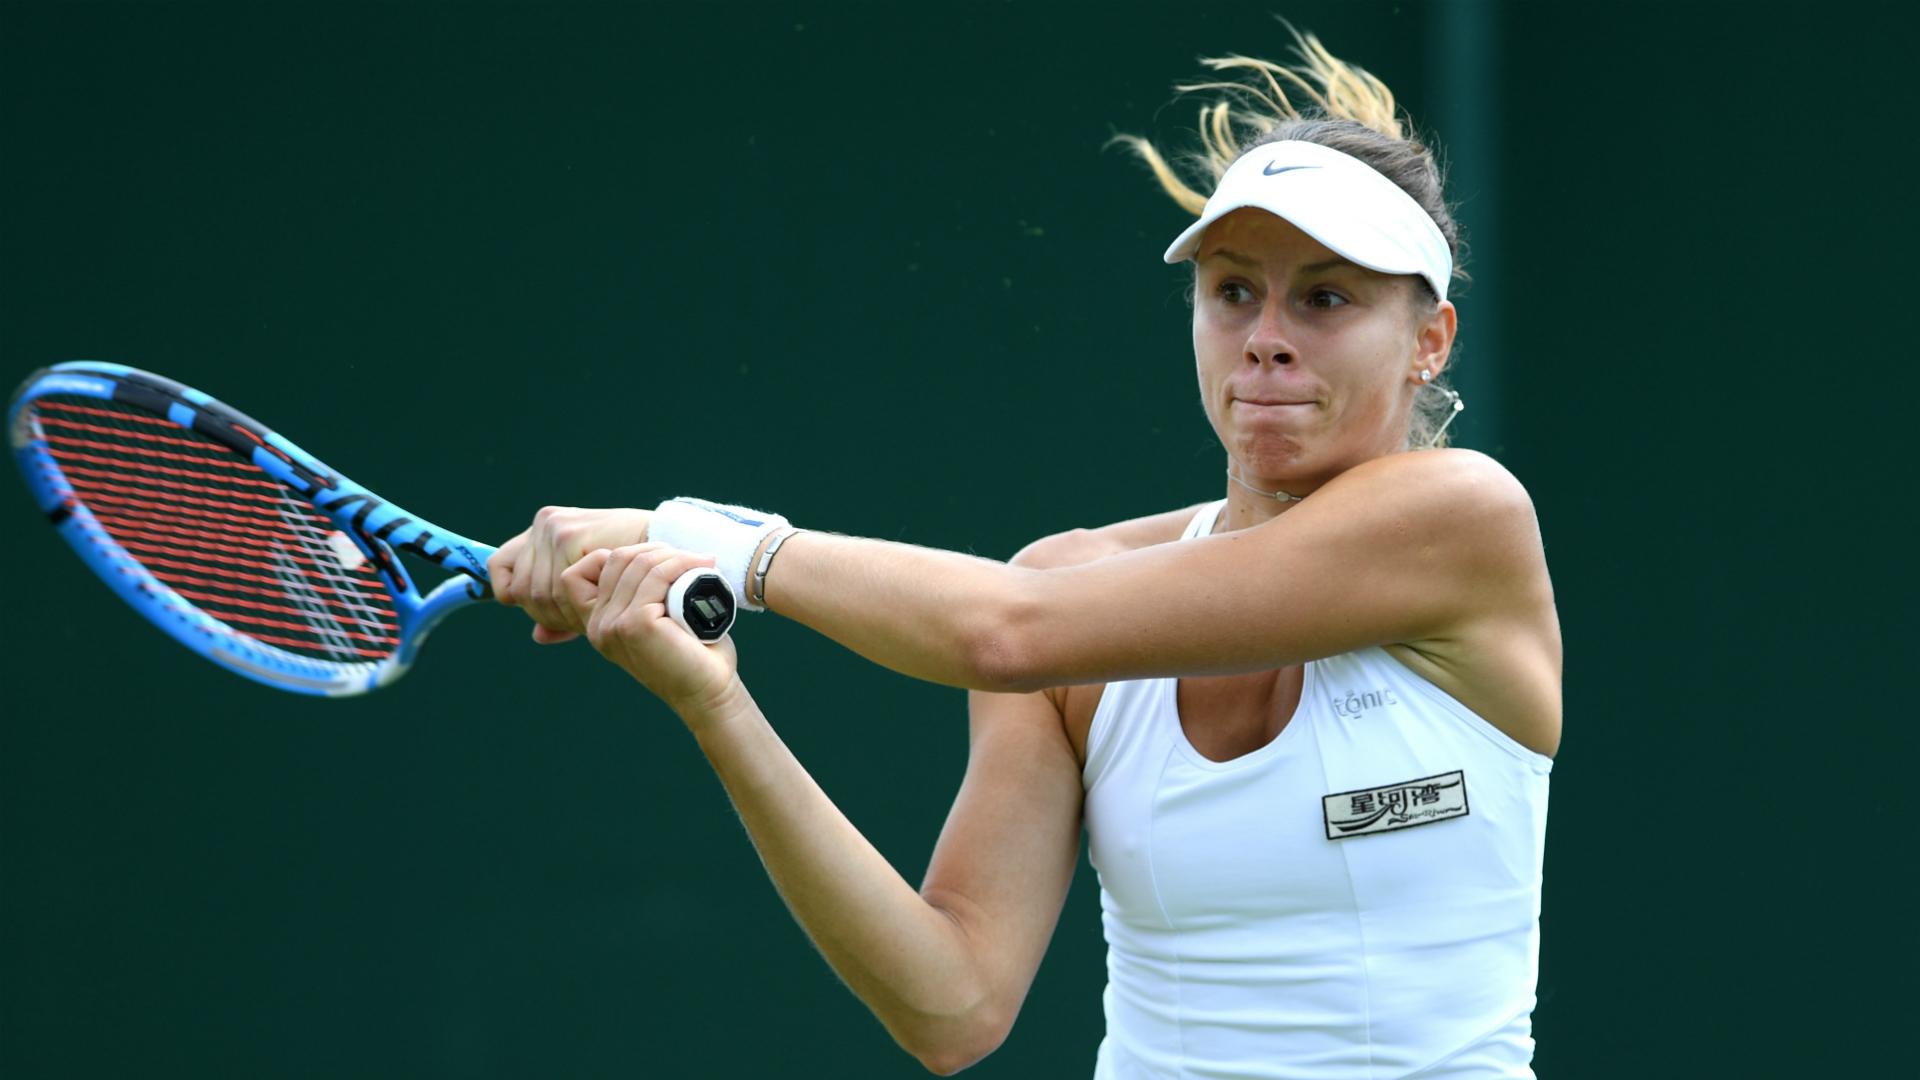 Qualifier Linette wins epic Bronx Open final